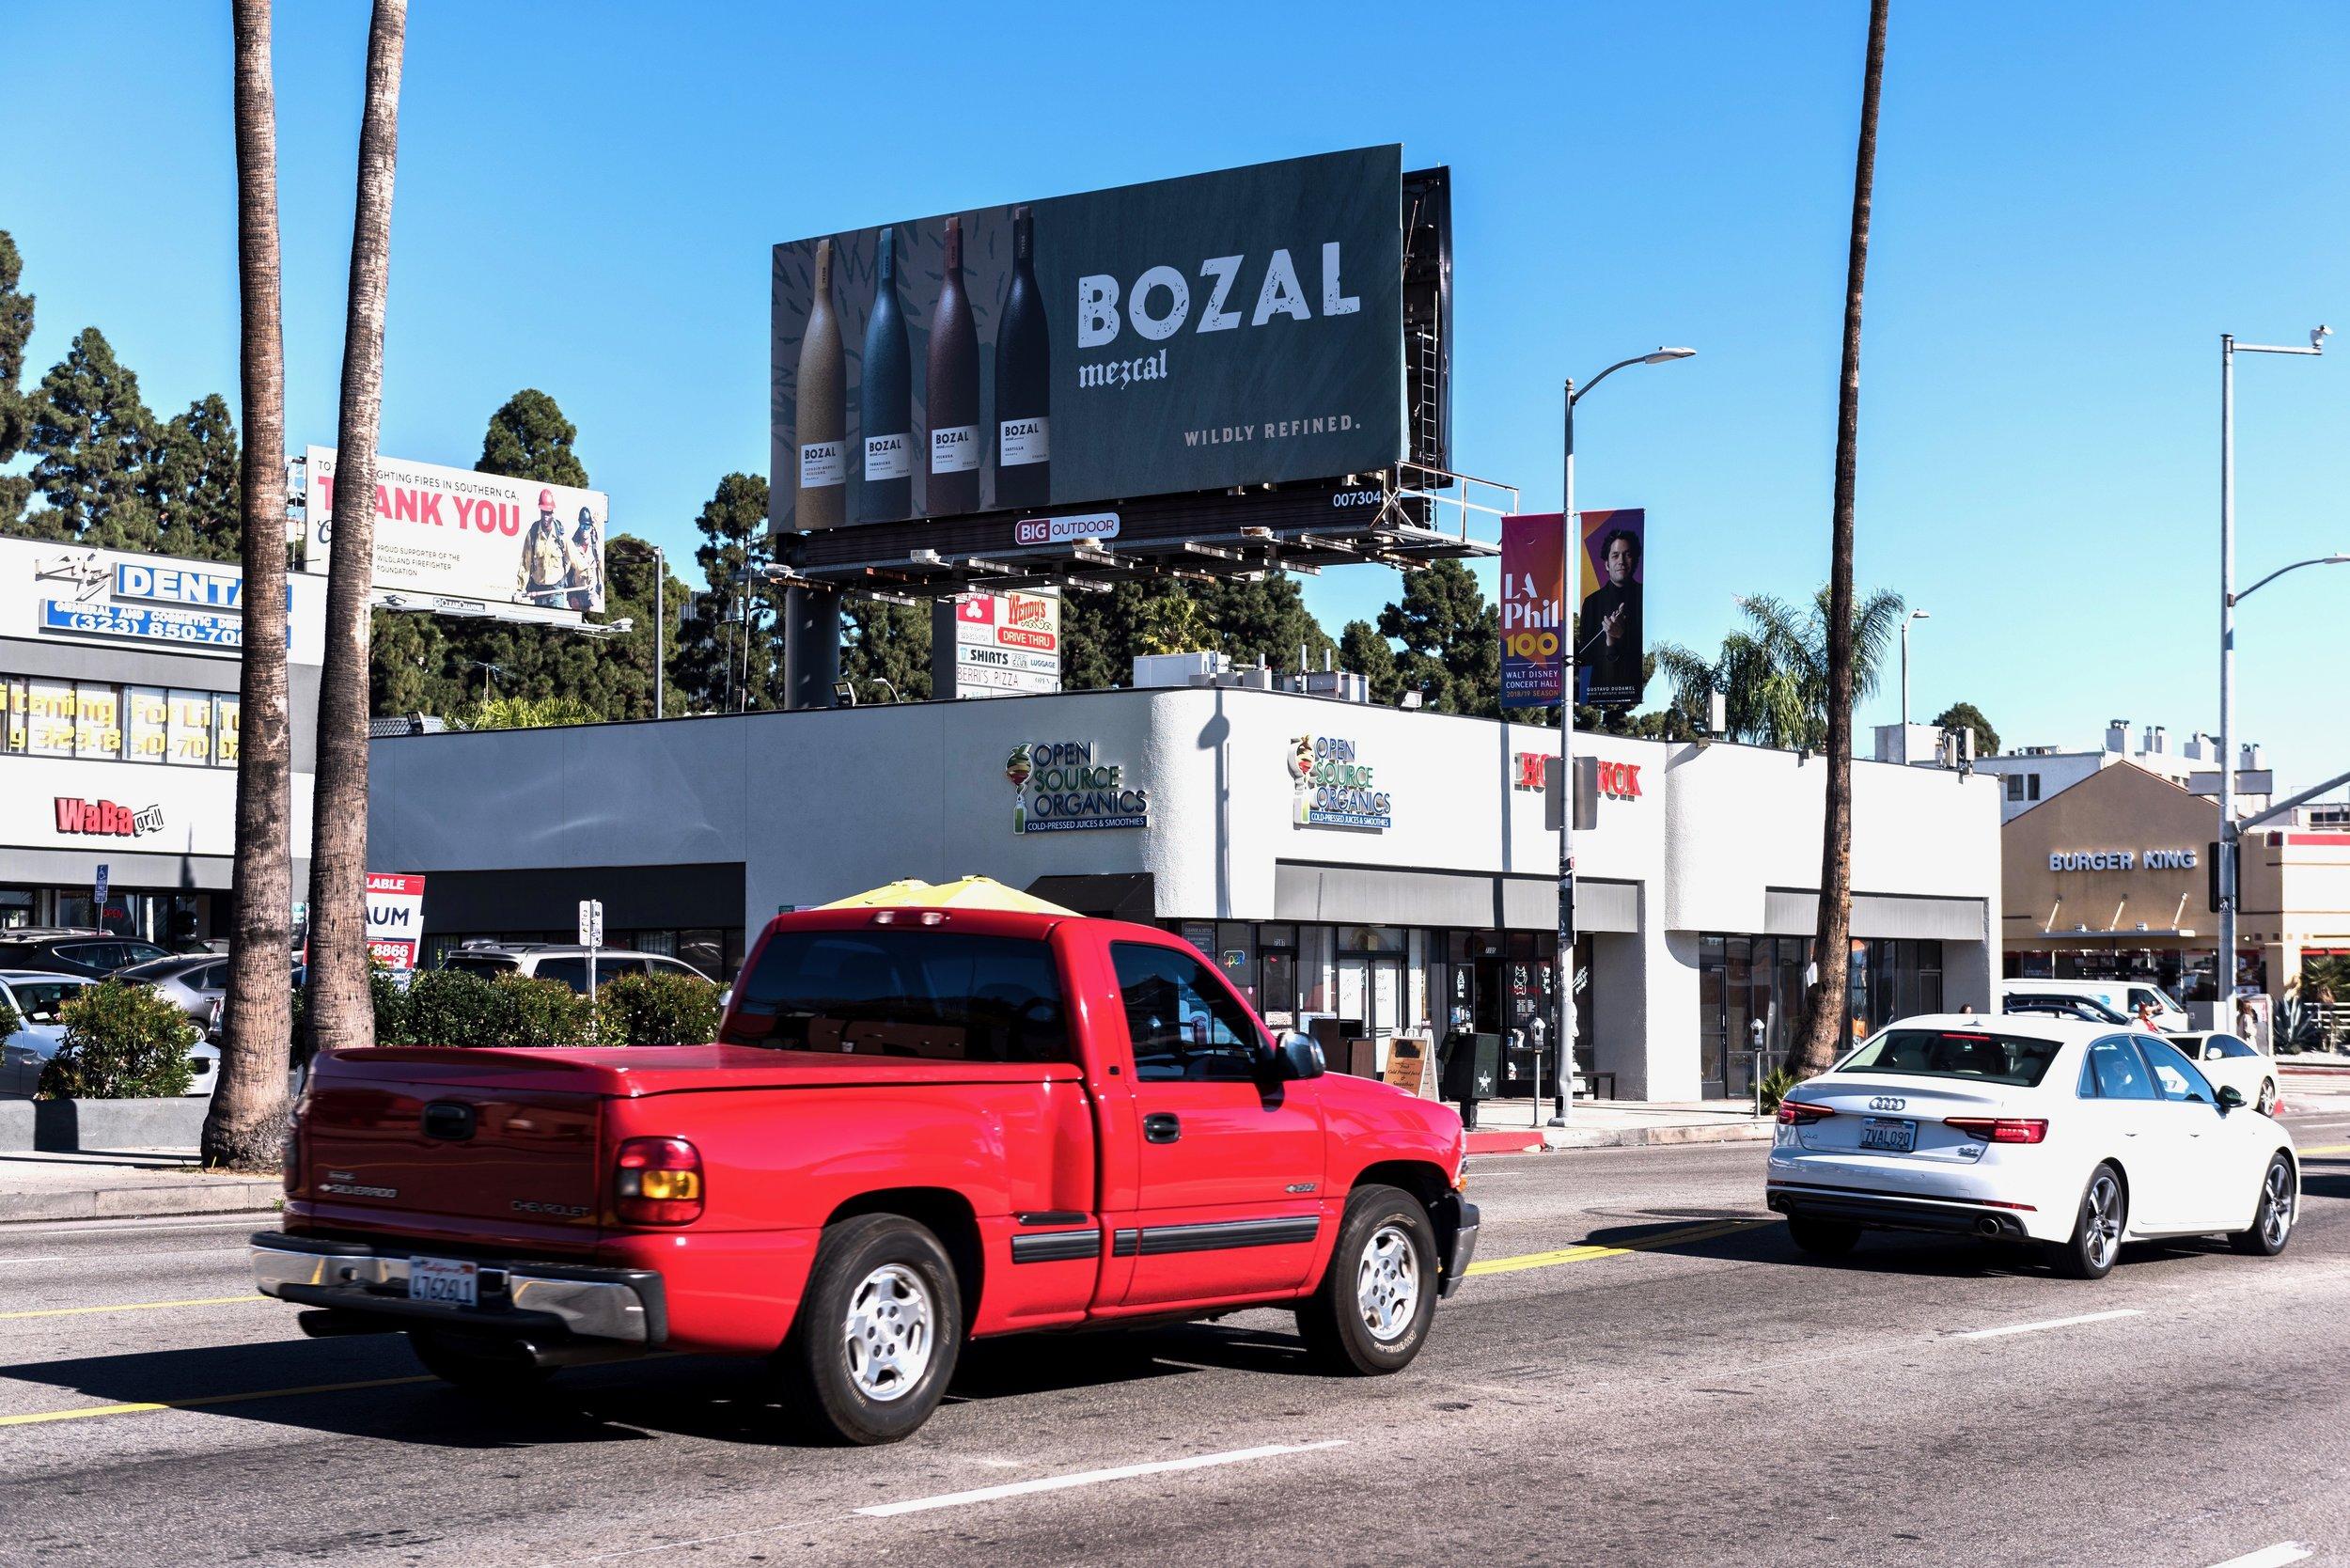 BOZAL (3 badge).jpg